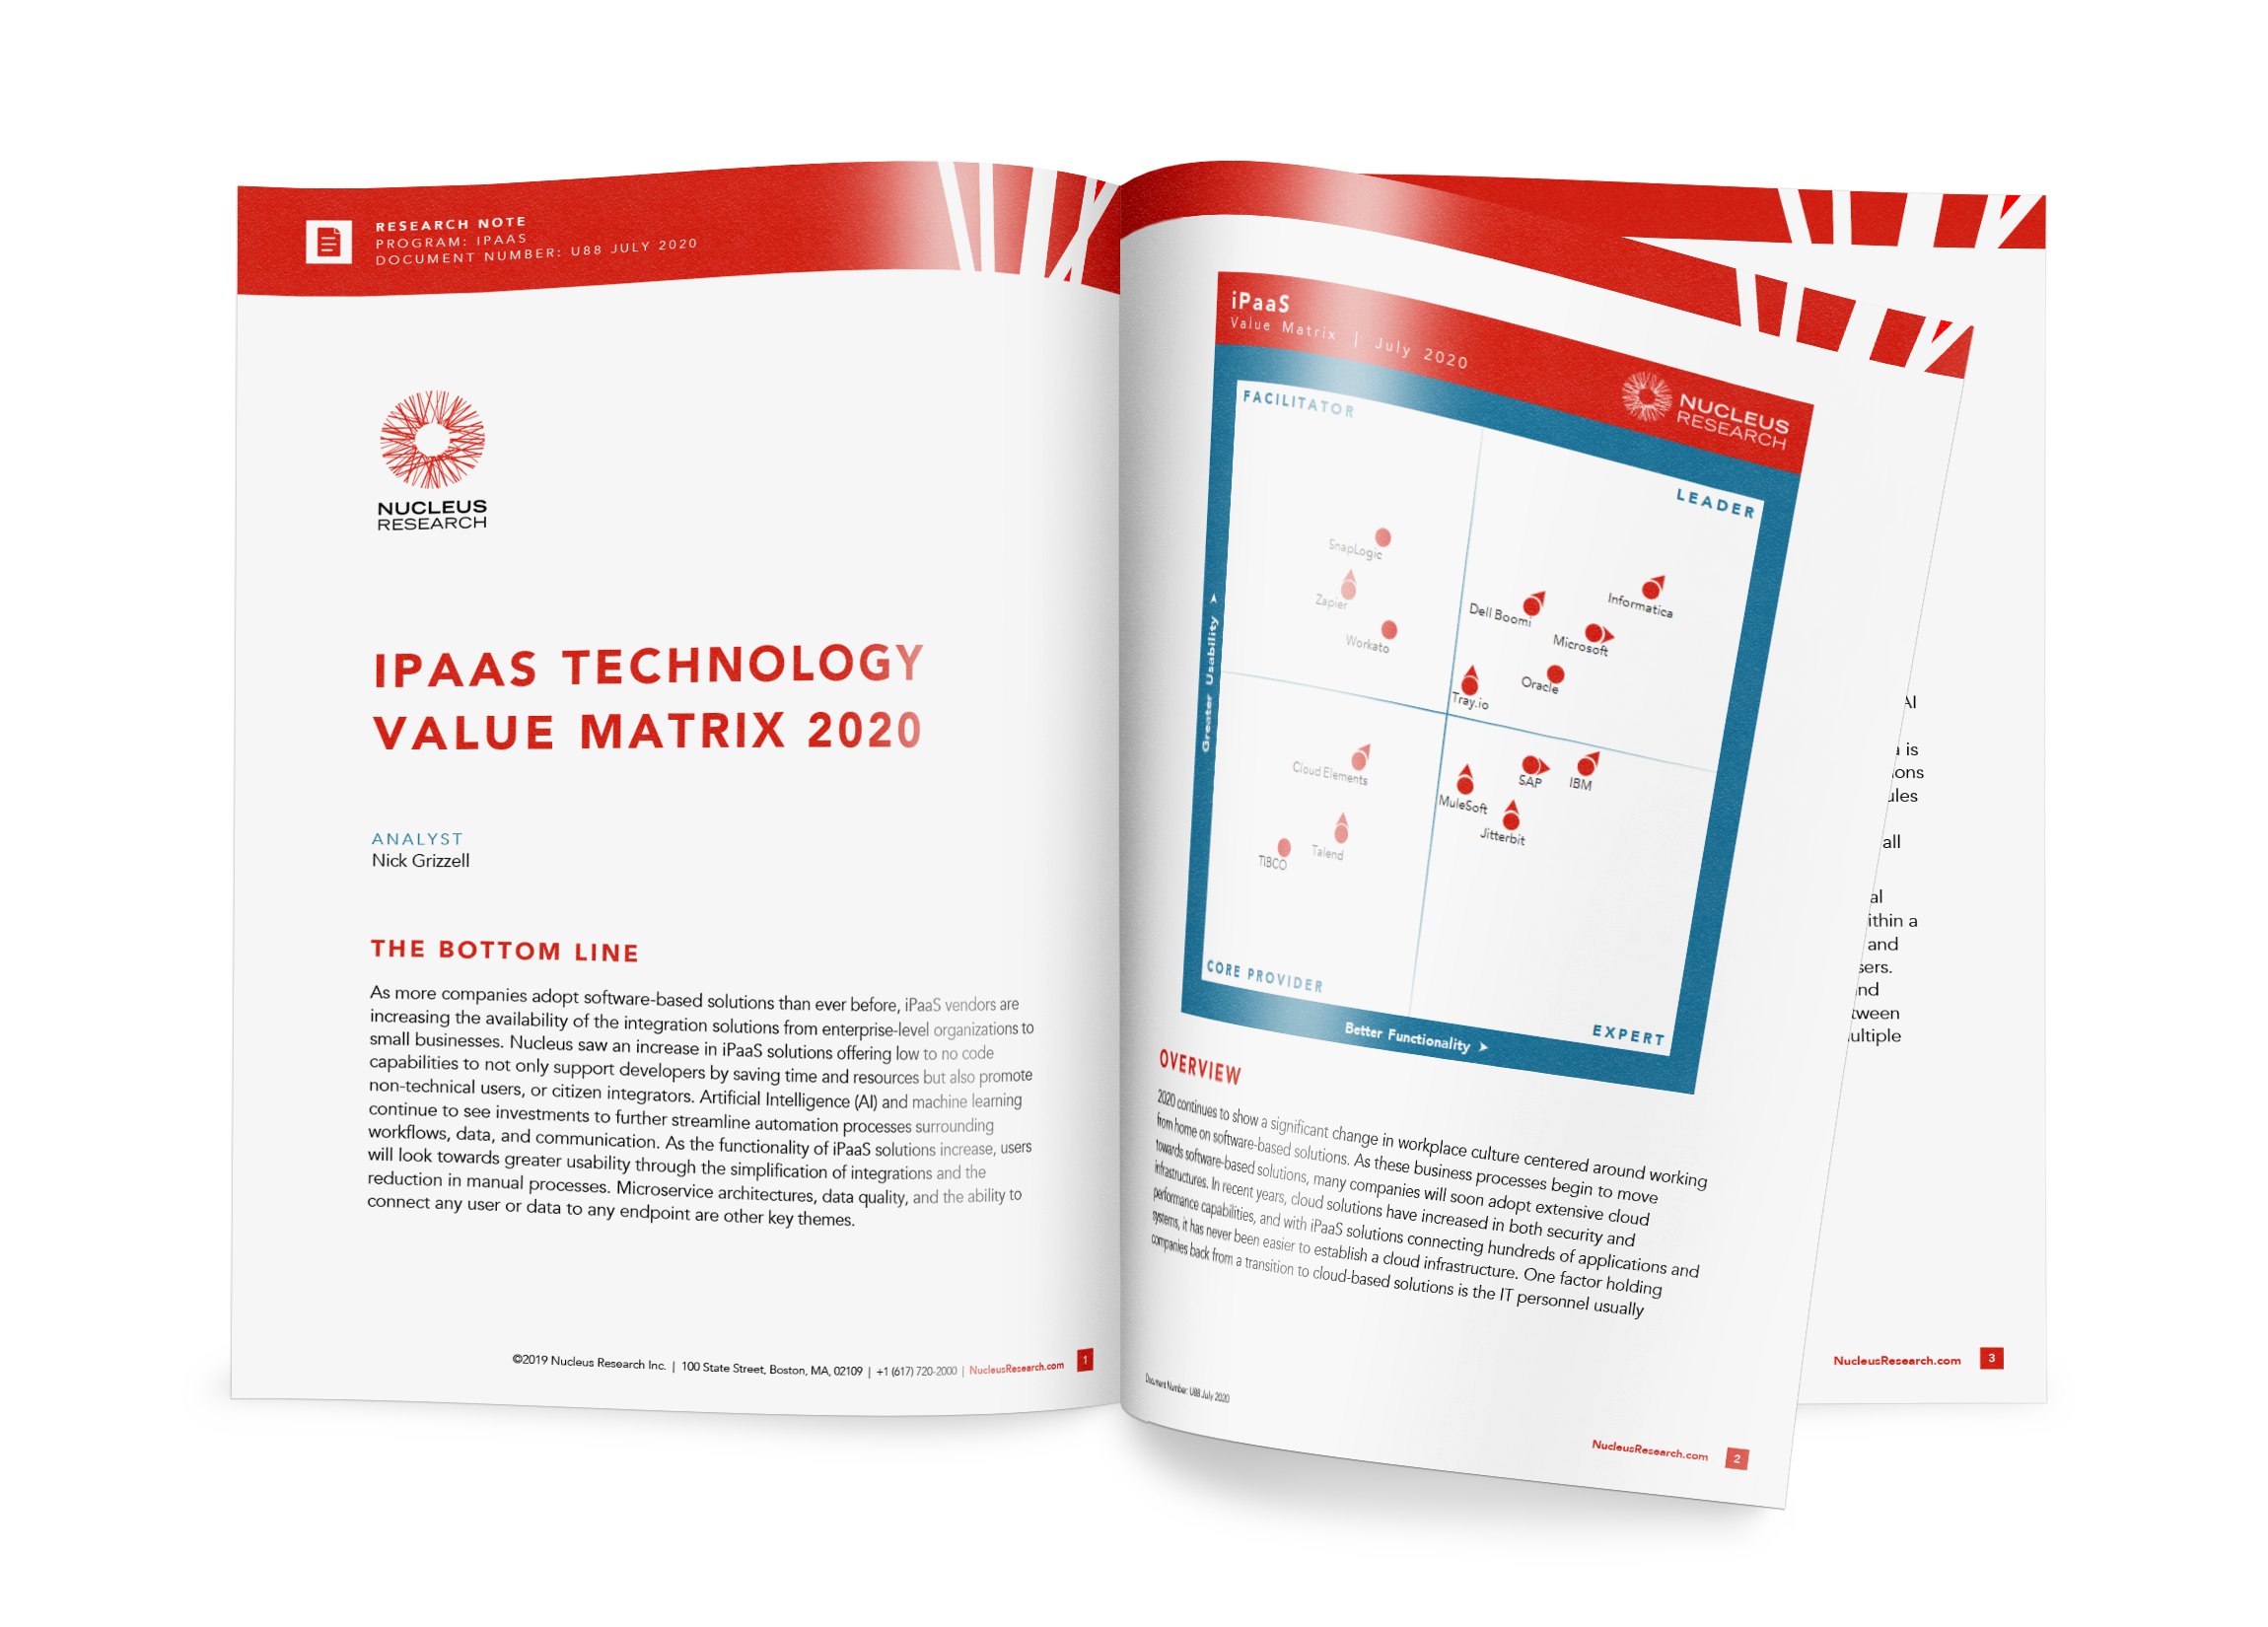 Nucleus Research 2020 Value Matrix